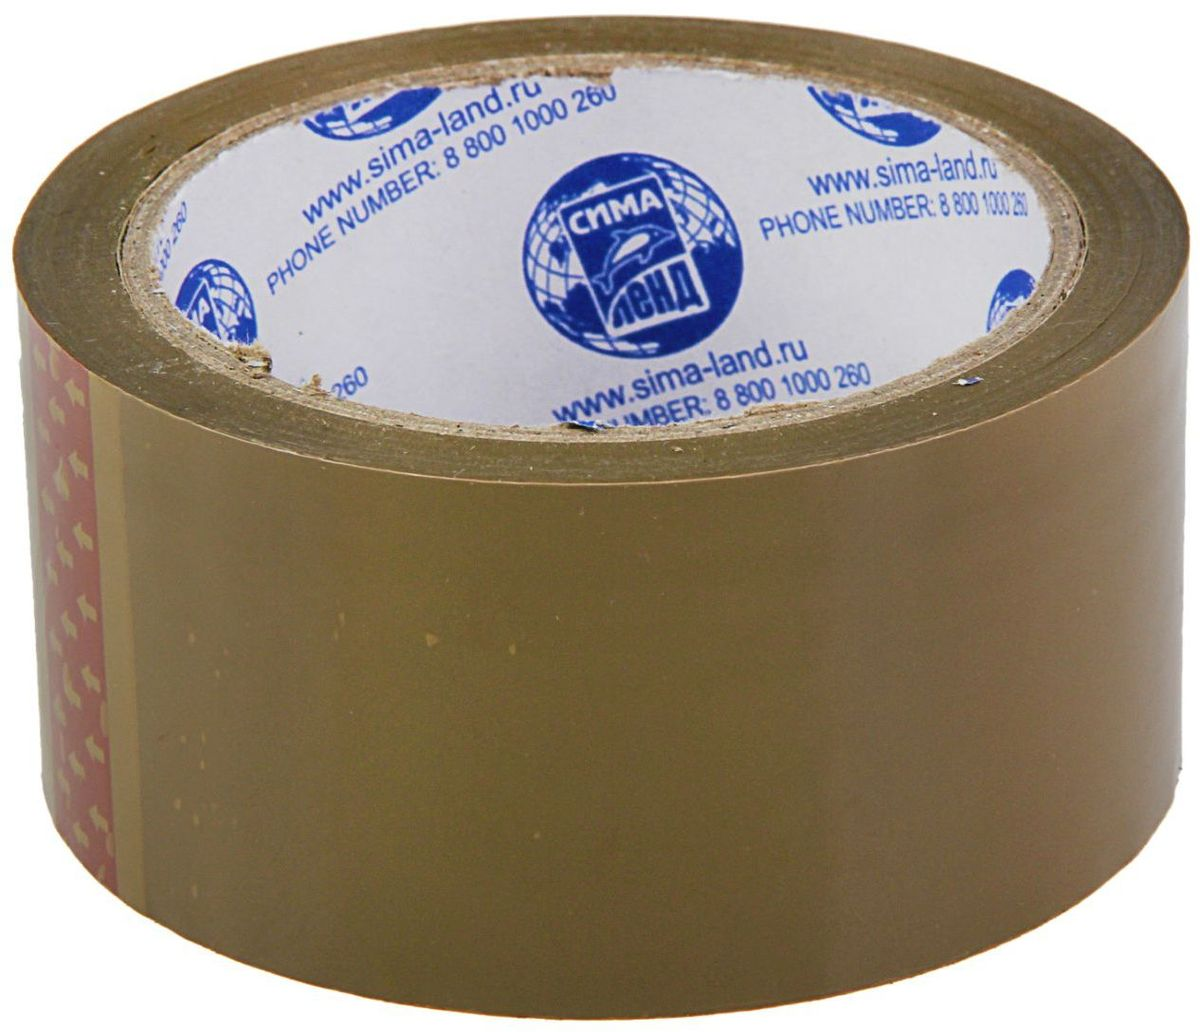 NoName Клейкая лента 48 мм х 66 м цвет темно-коричневый